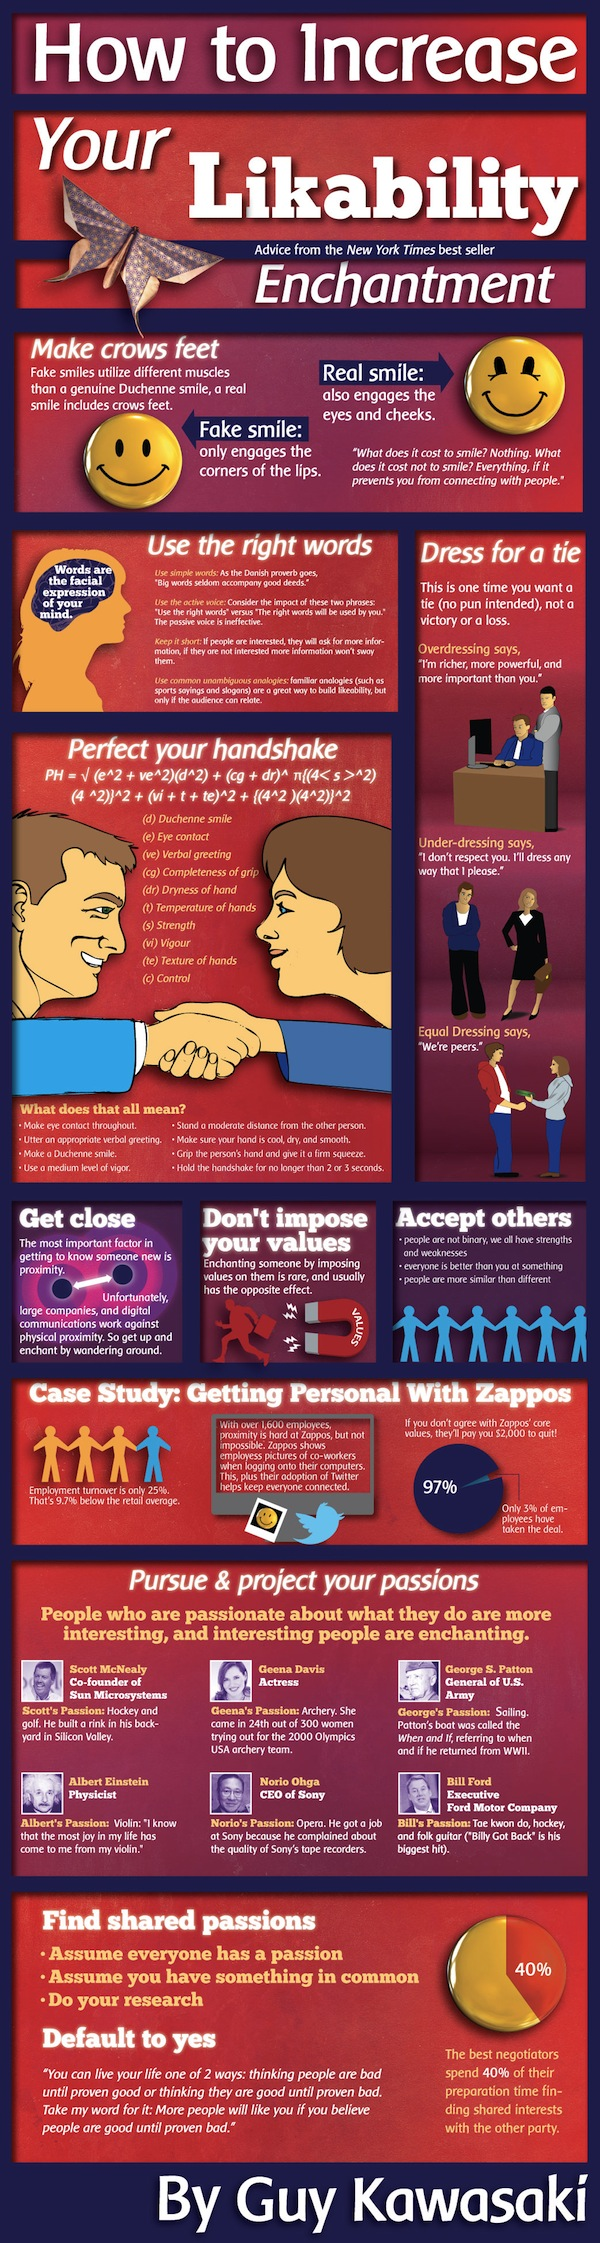 Increase likability